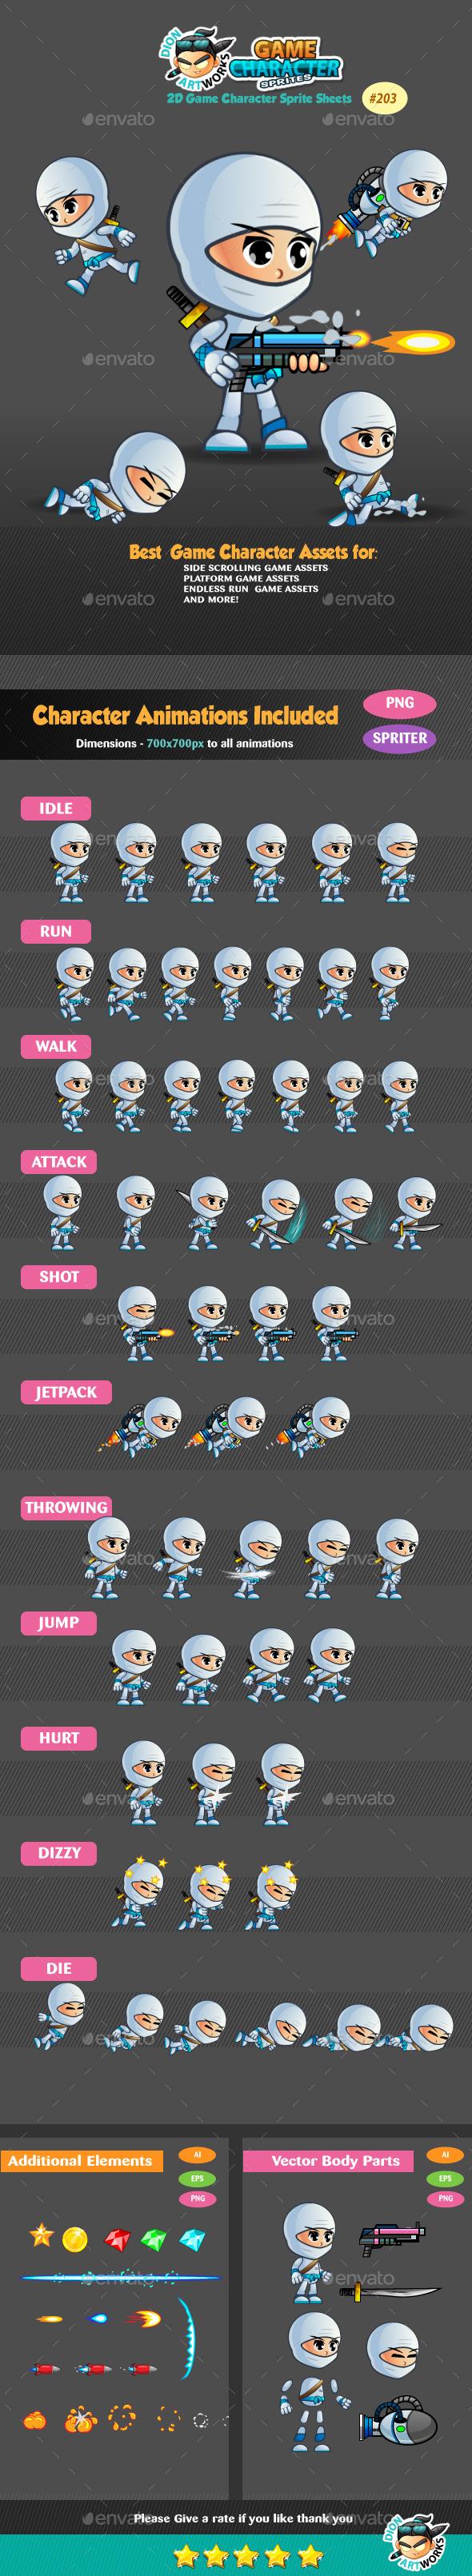 White Girl Ninja 2D Game Character Sprites - Sprites Game Assets